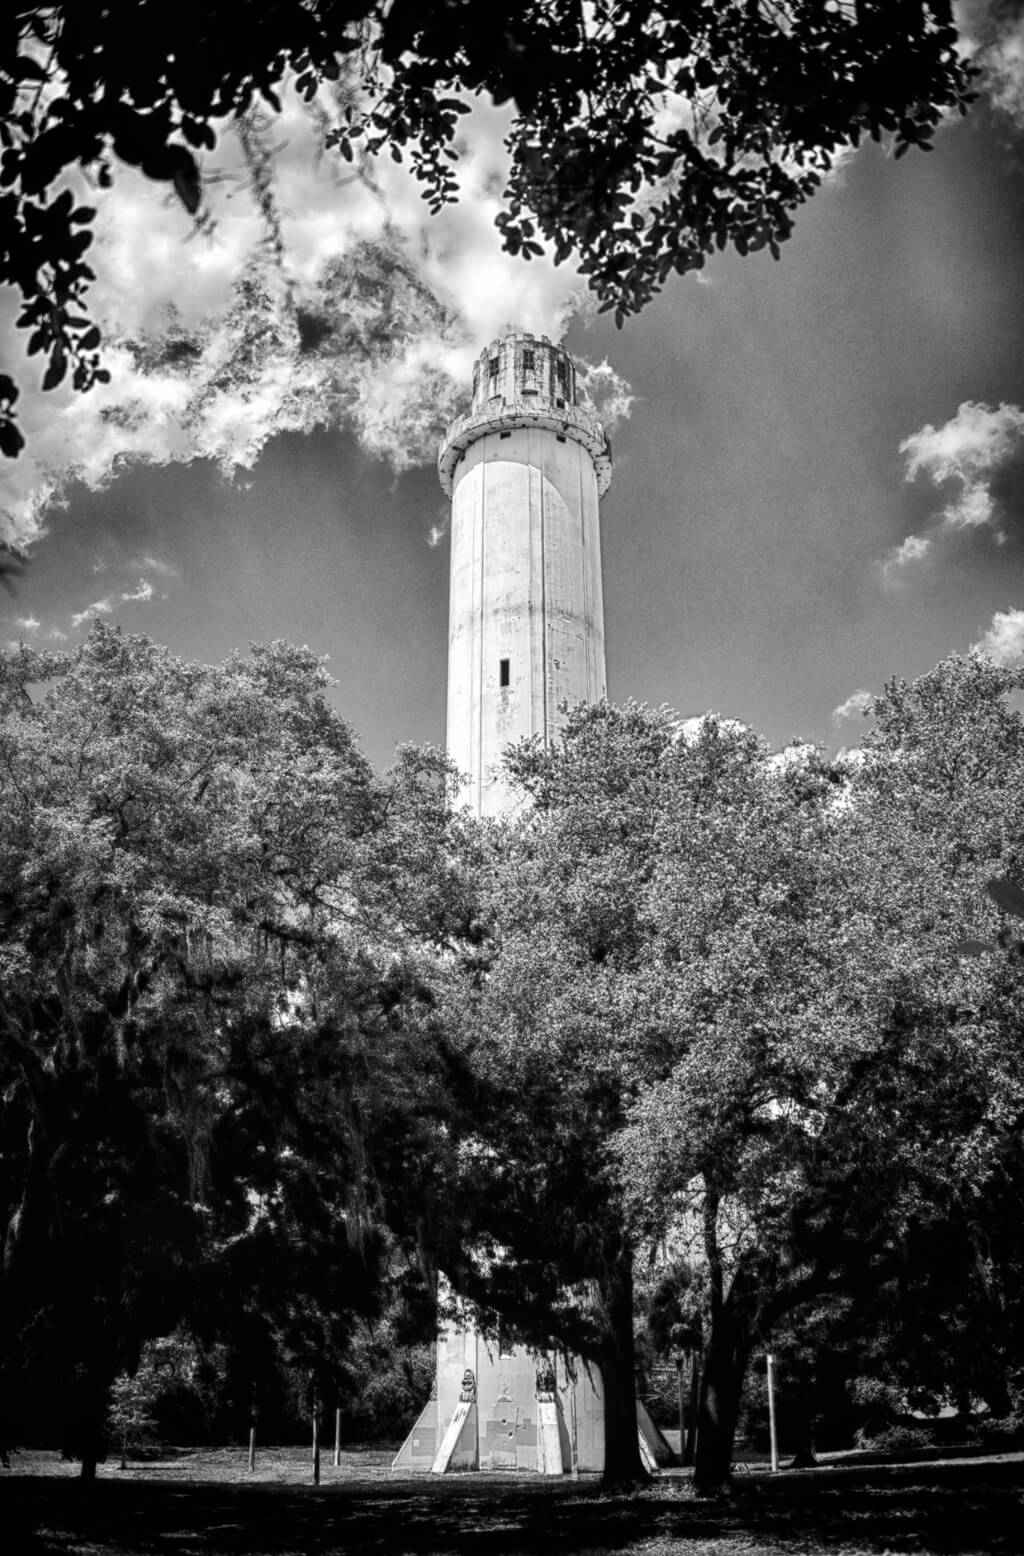 Sulphur Springs Water Tower, Tampa, FL